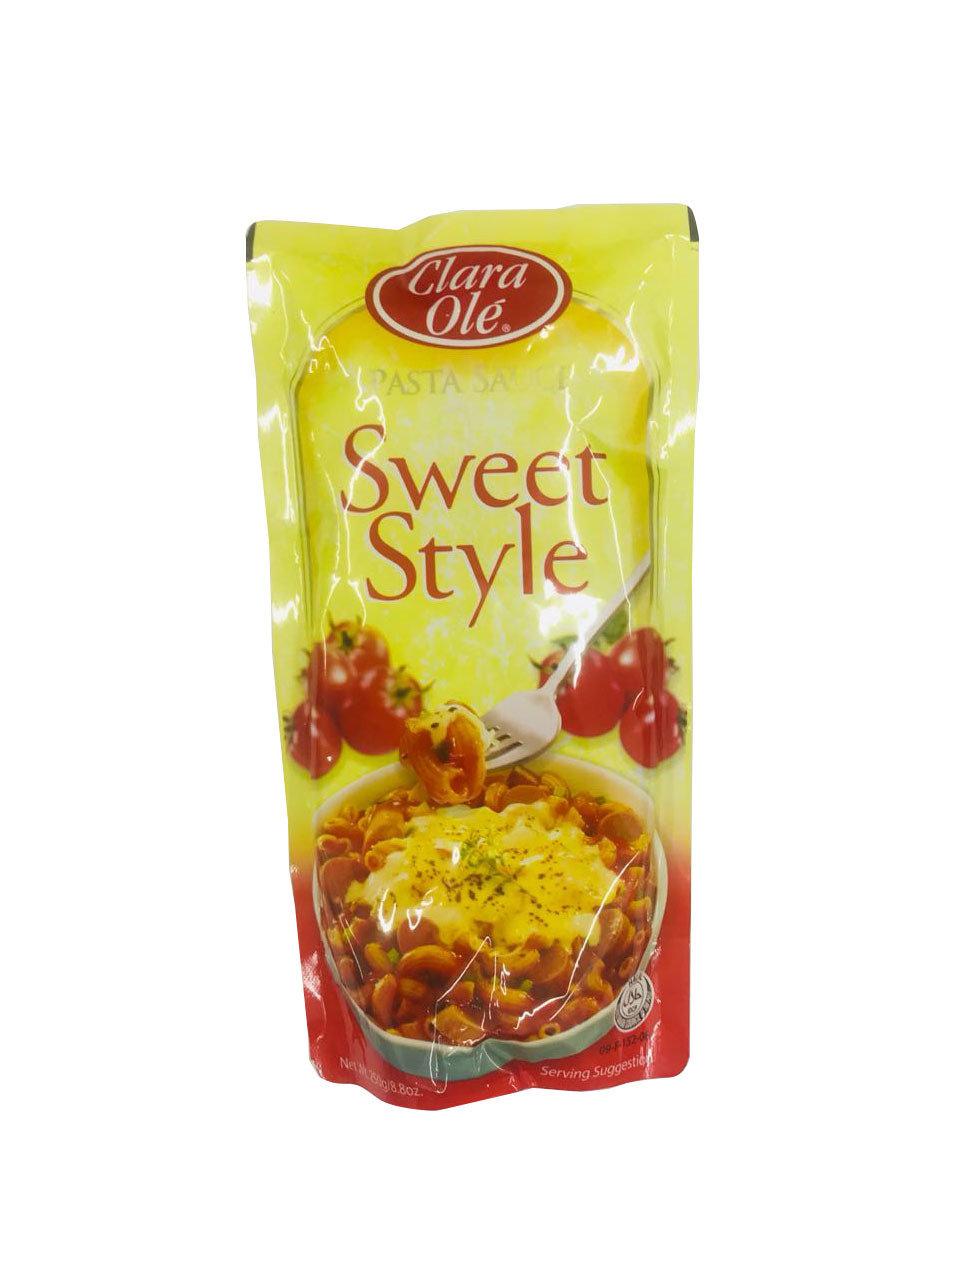 Clara Ole Sweet Style Spaghetti Sauce 250g